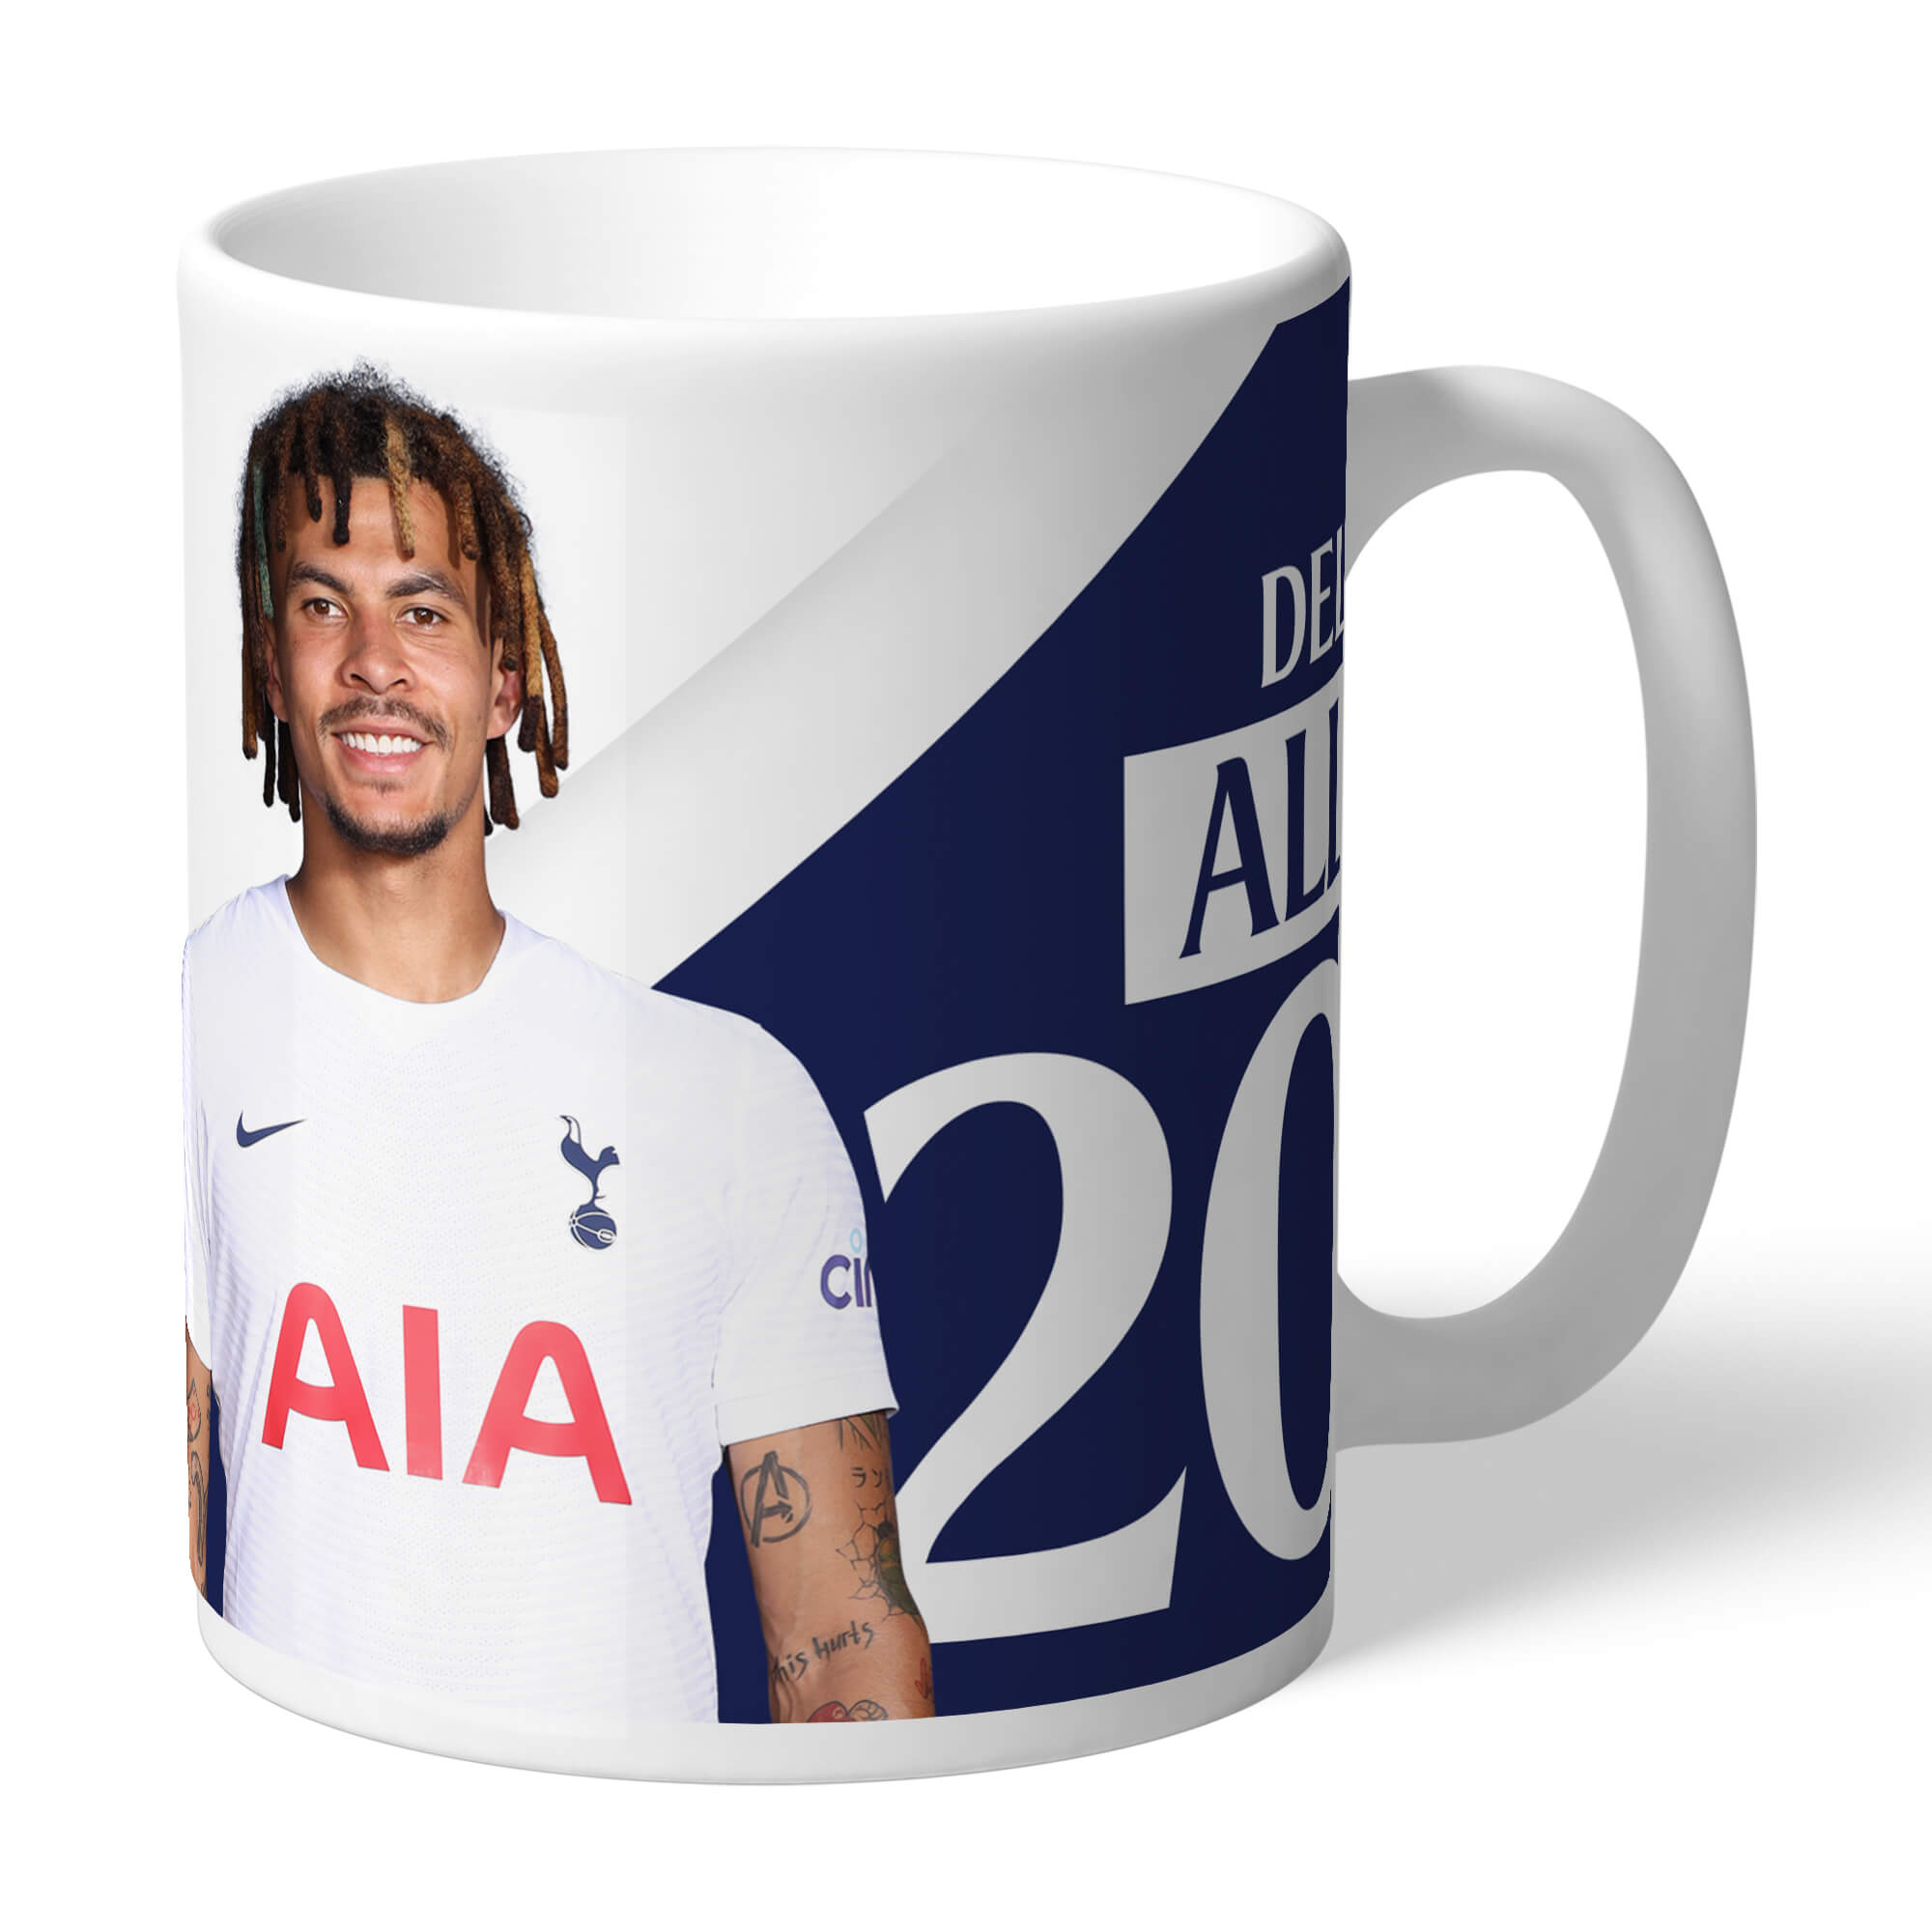 Tottenham Hotspur Alli Autograph Mug